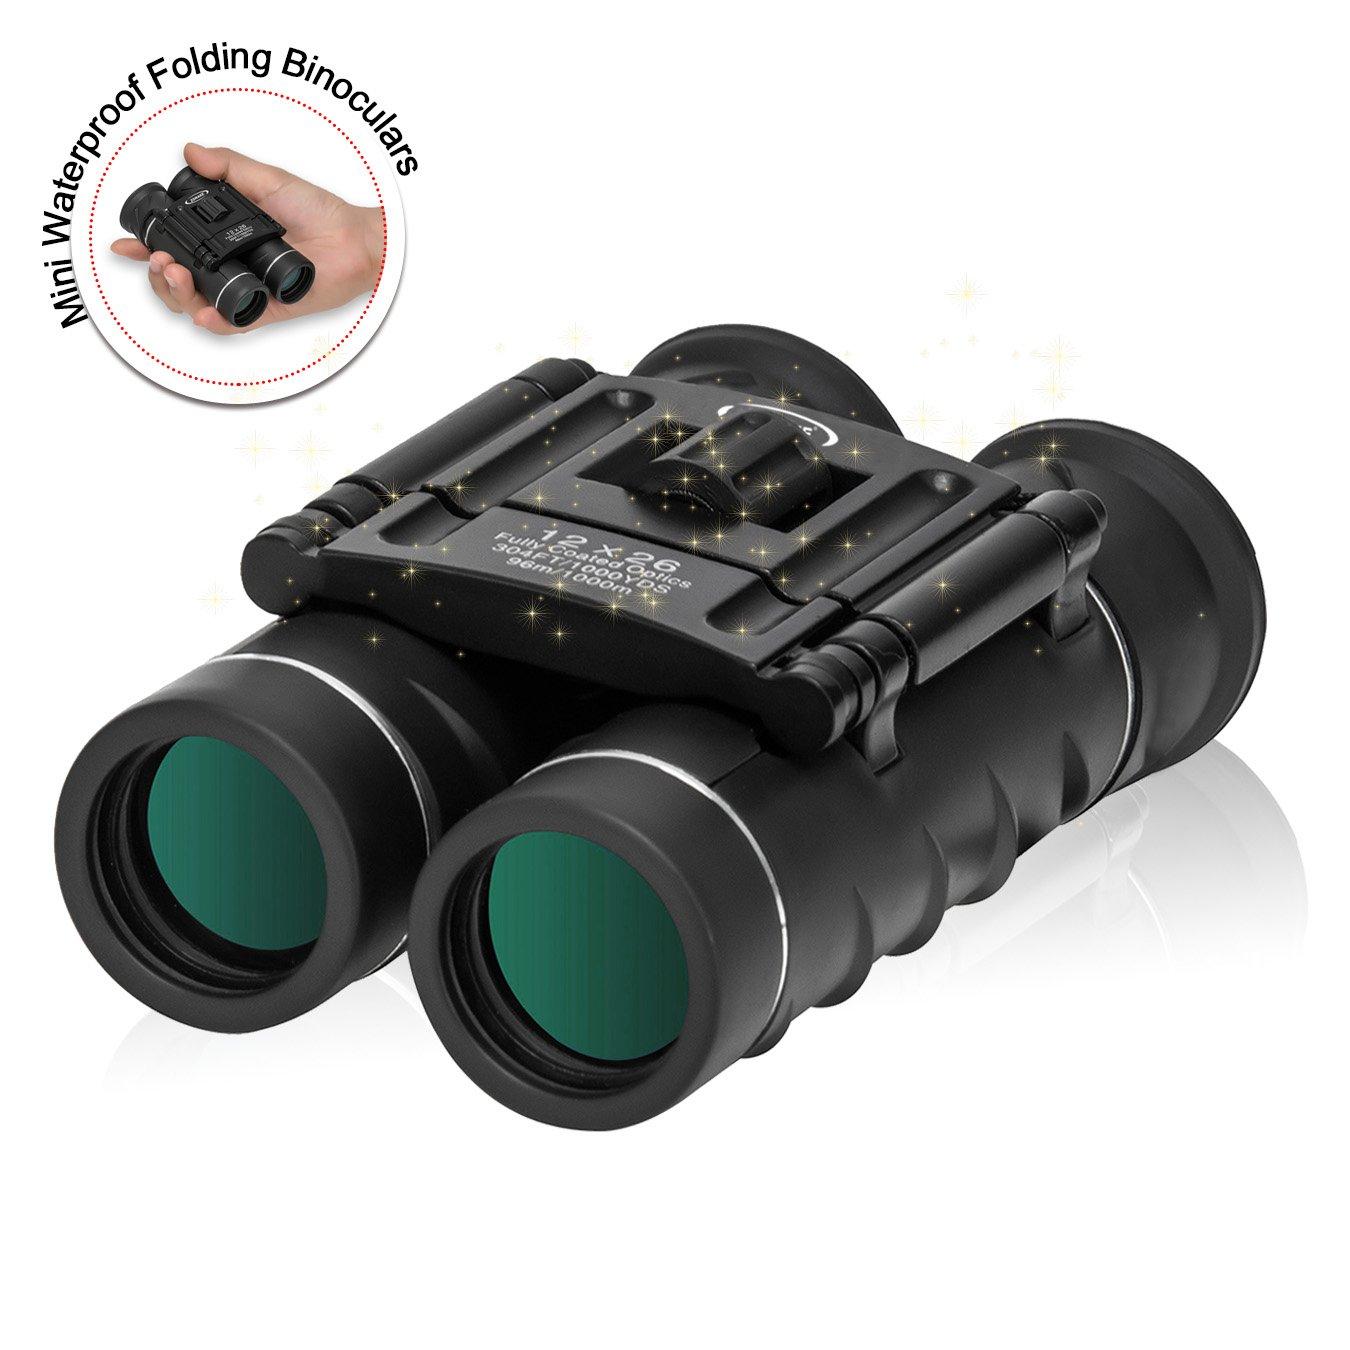 Mini Waterproof Folding Binoculars (12x26) High Powered Binocular with Weak Light Night Vision Clear Bird Watching ZOMAKE 10*26